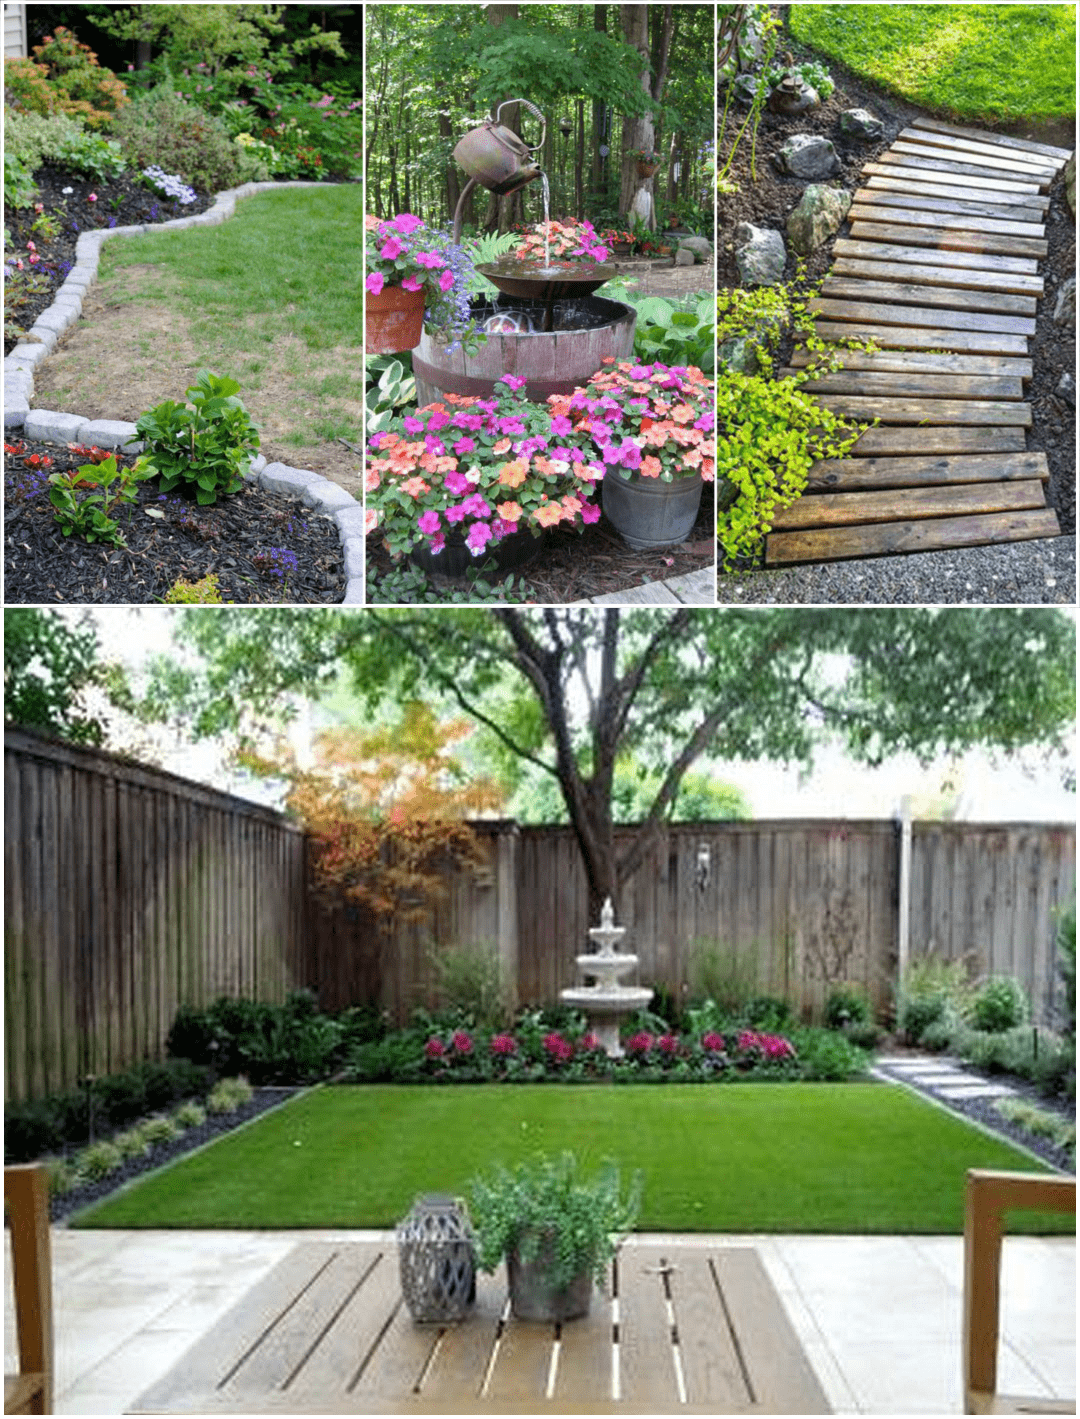 Simphome.com A beautiful backyard landscape design for outdoor patio decorating